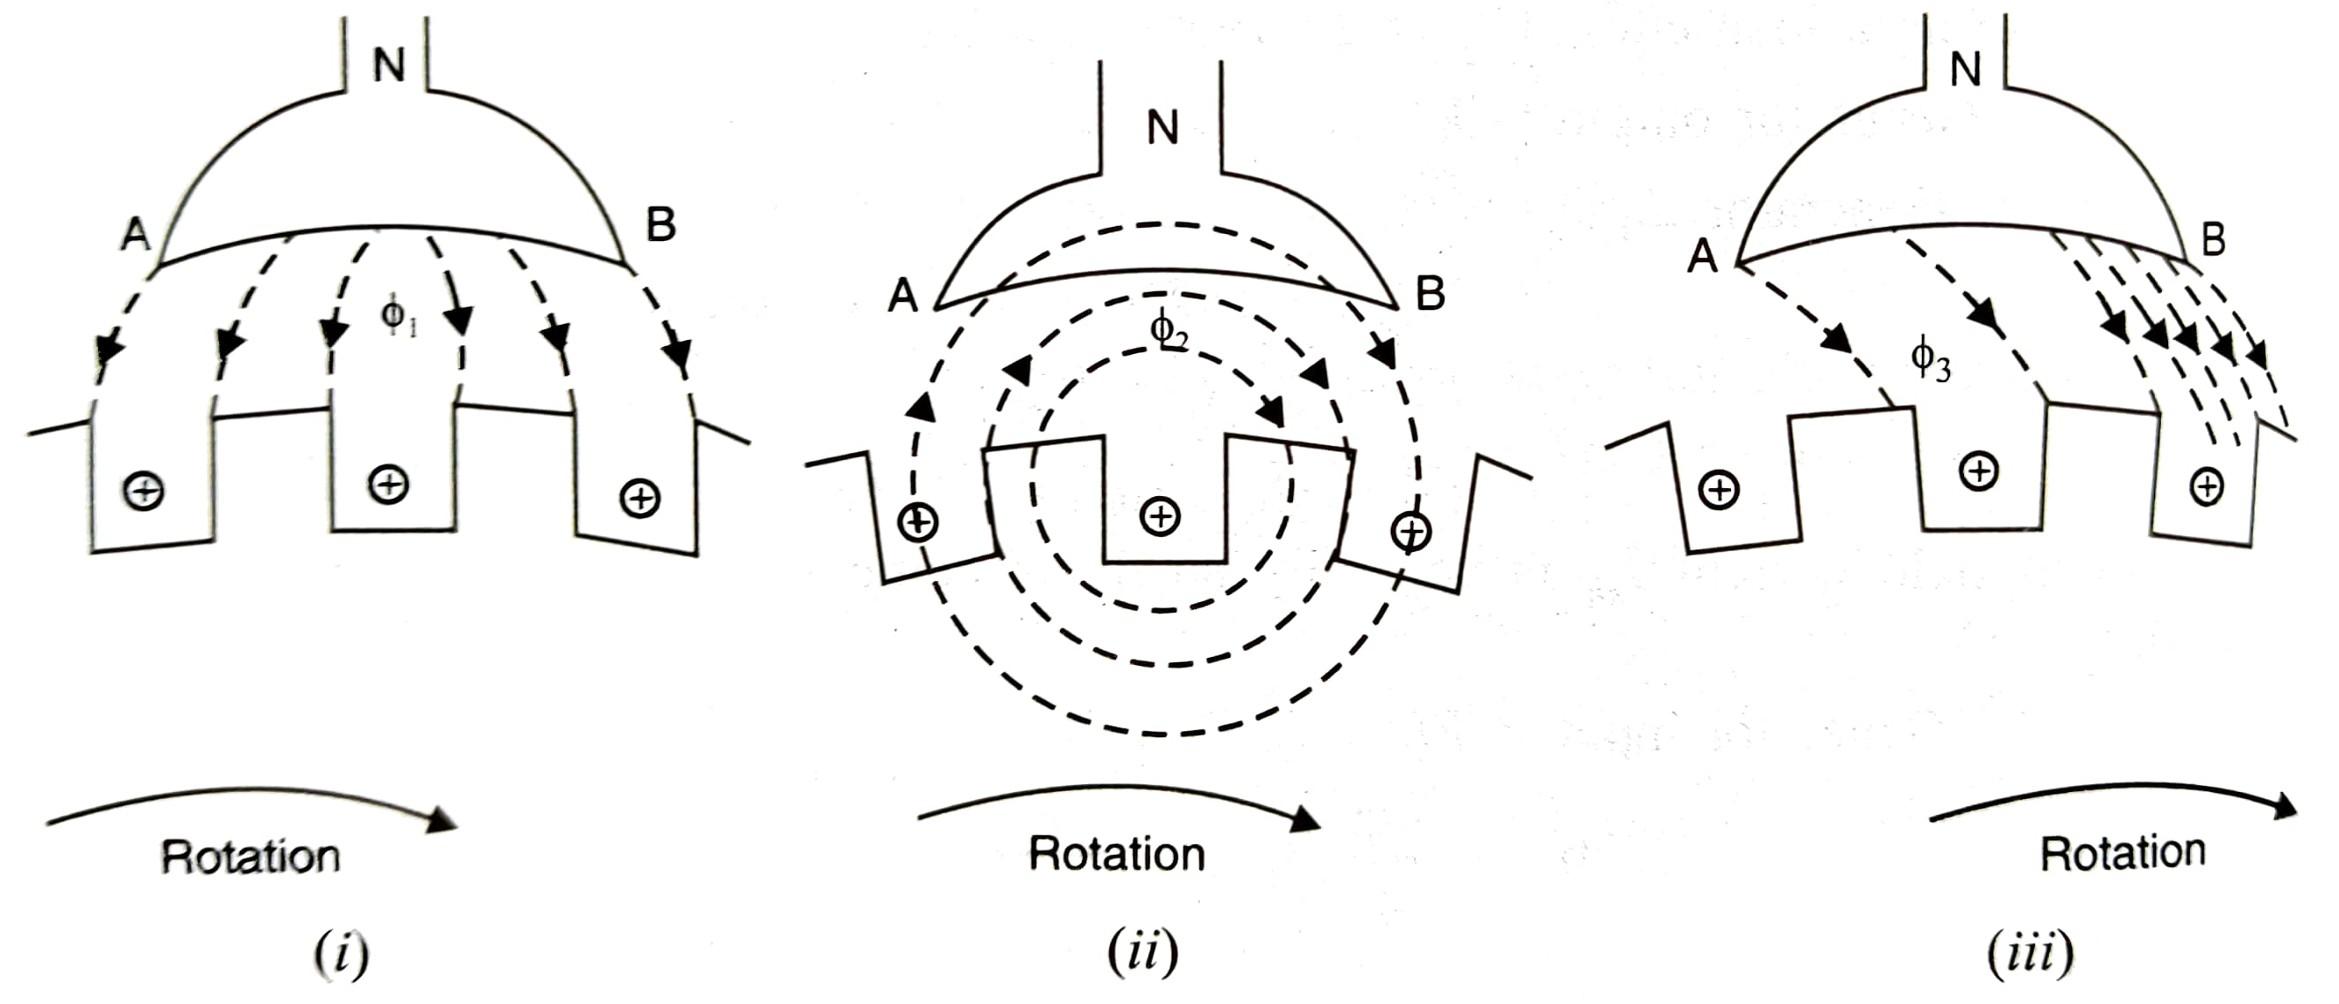 Armature Reaction in DC Generator